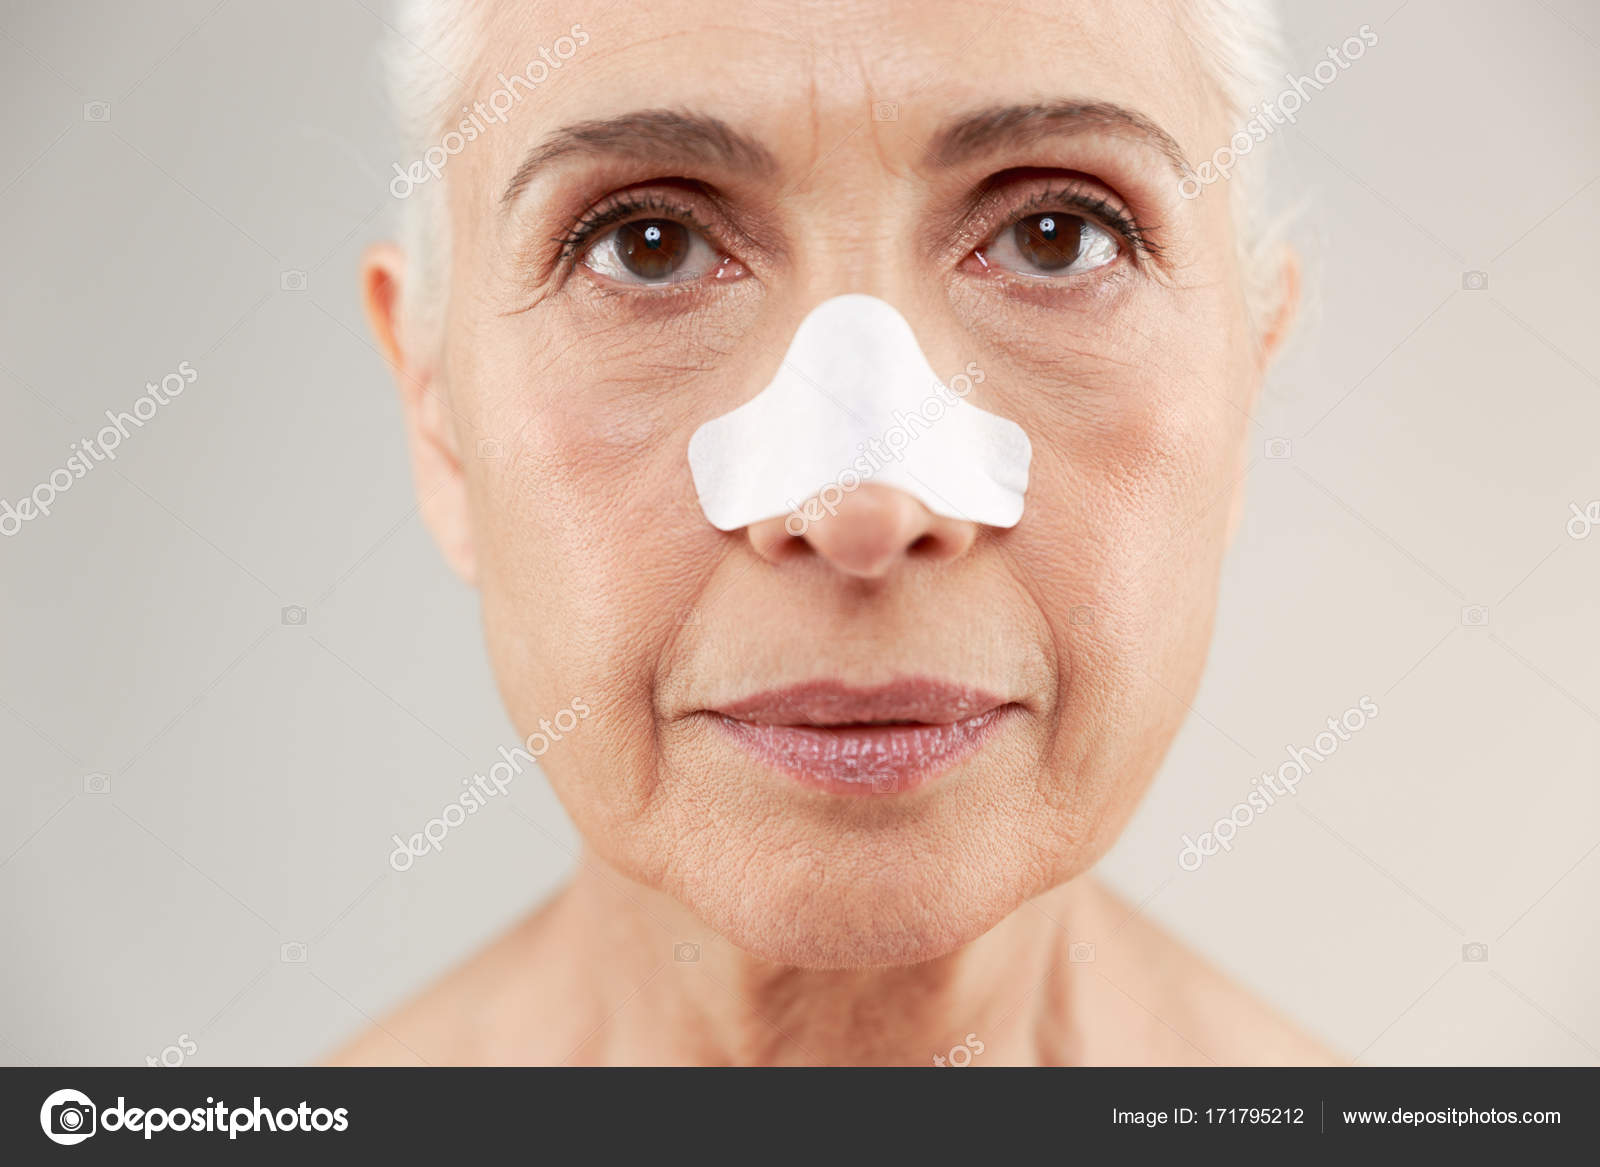 alte reife Gesichtsbehandlung